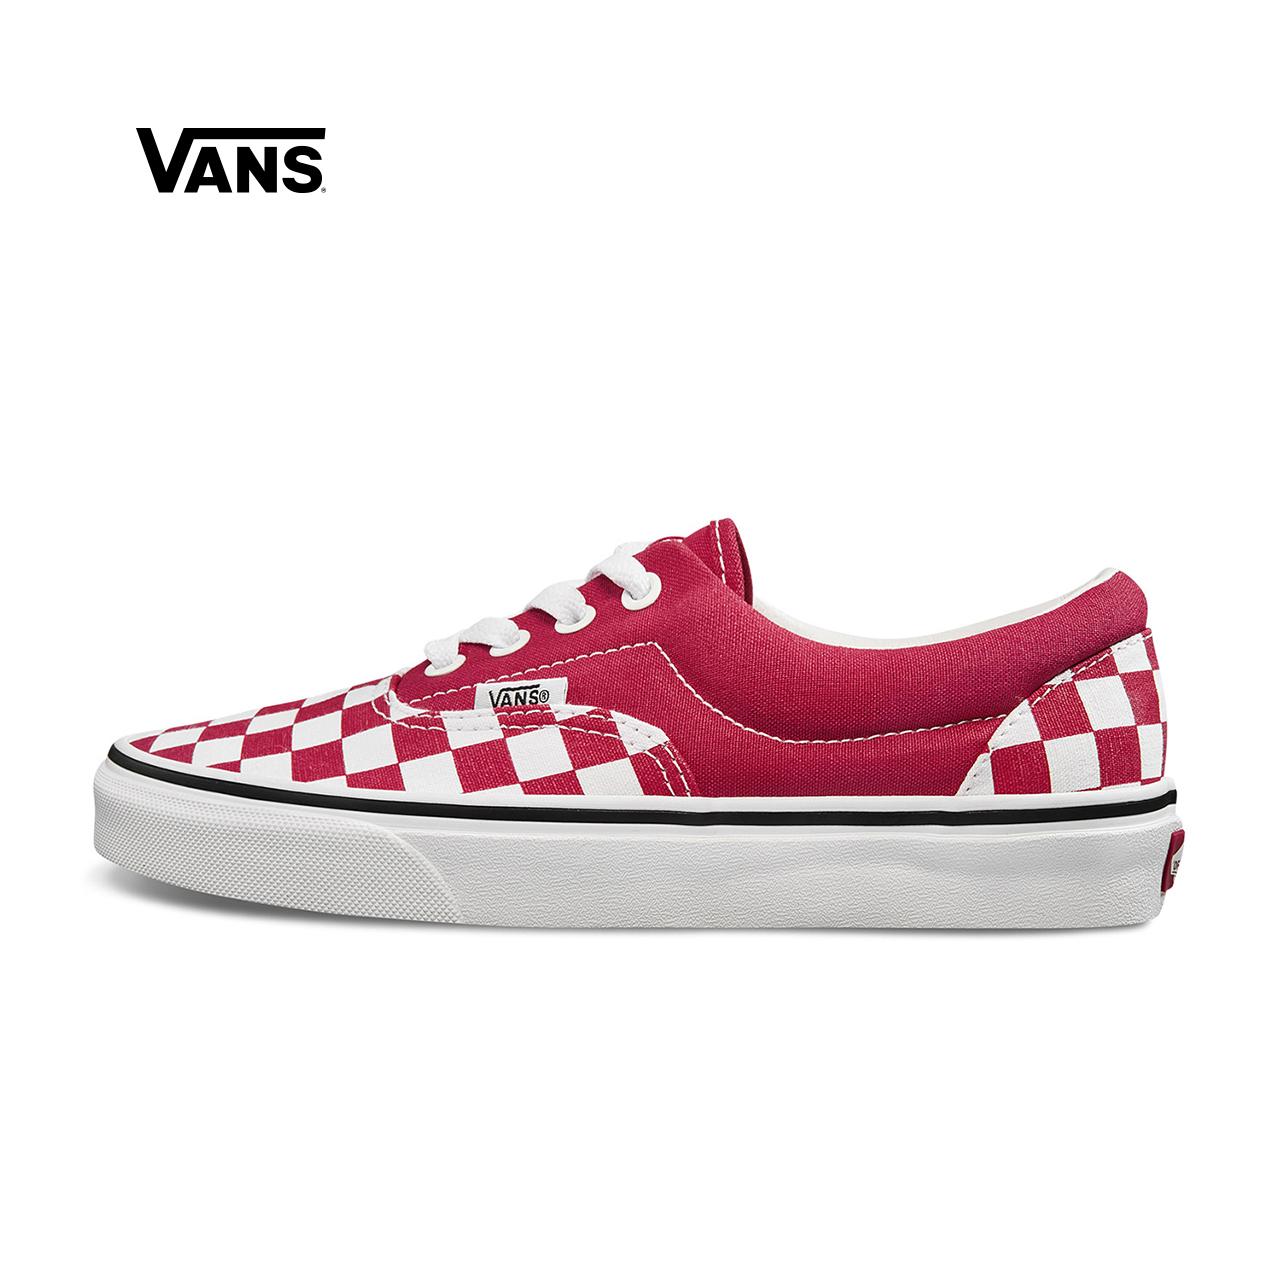 Vans范斯 经典系列 Era帆布鞋 低帮男女棋盘格新款官方正品